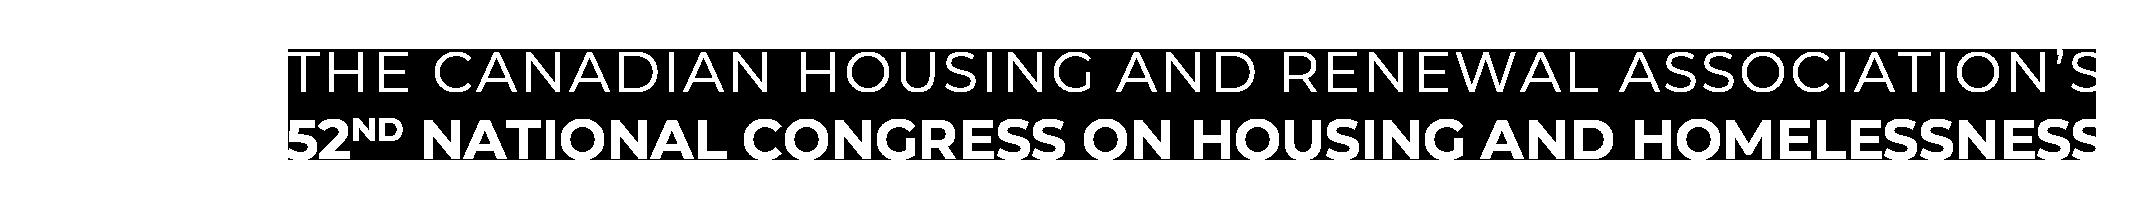 2020 Congress title Plus logo